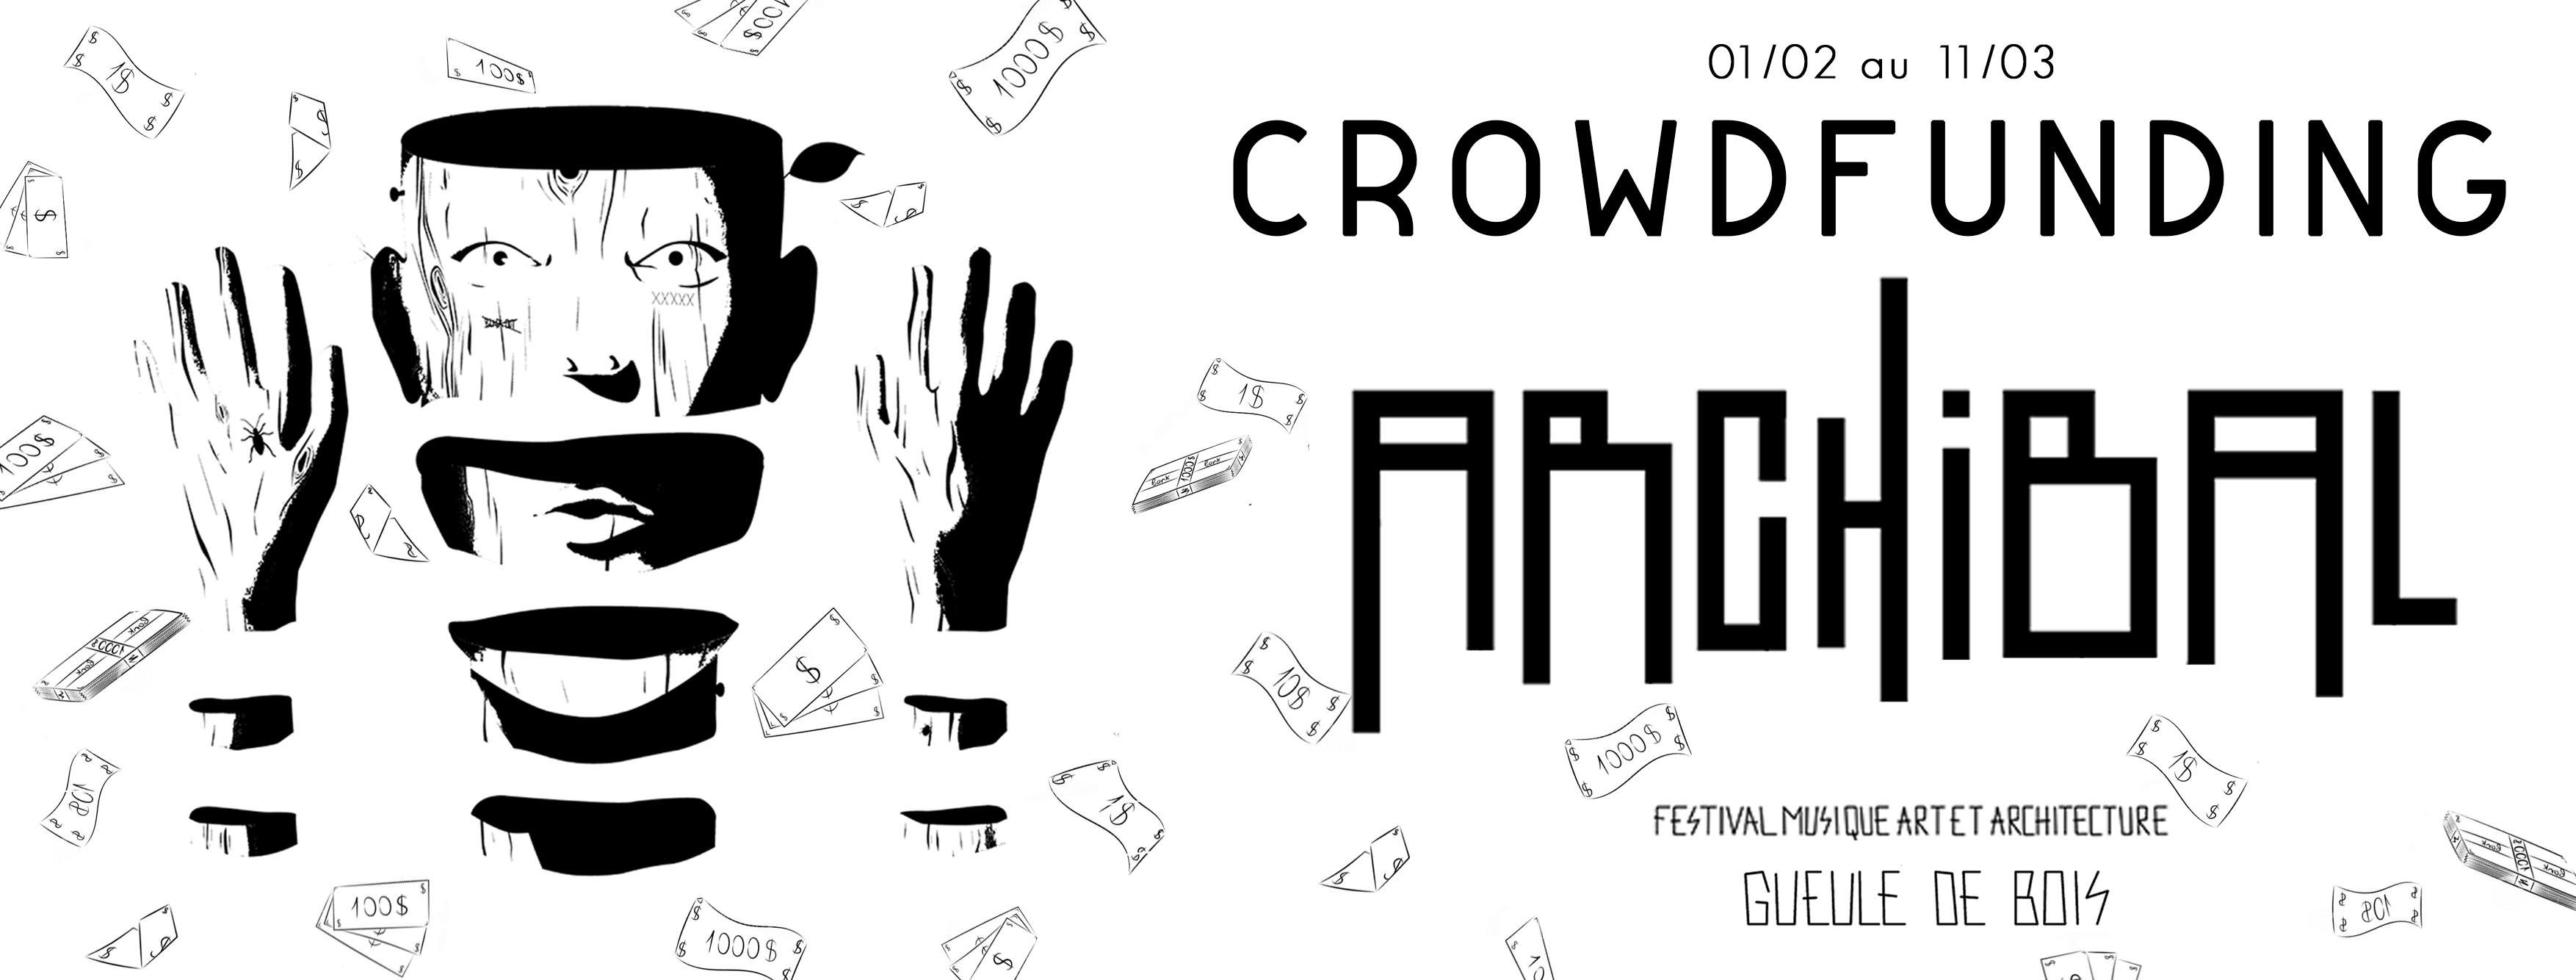 visuel_lancement_crowdfunding_nb.jpg